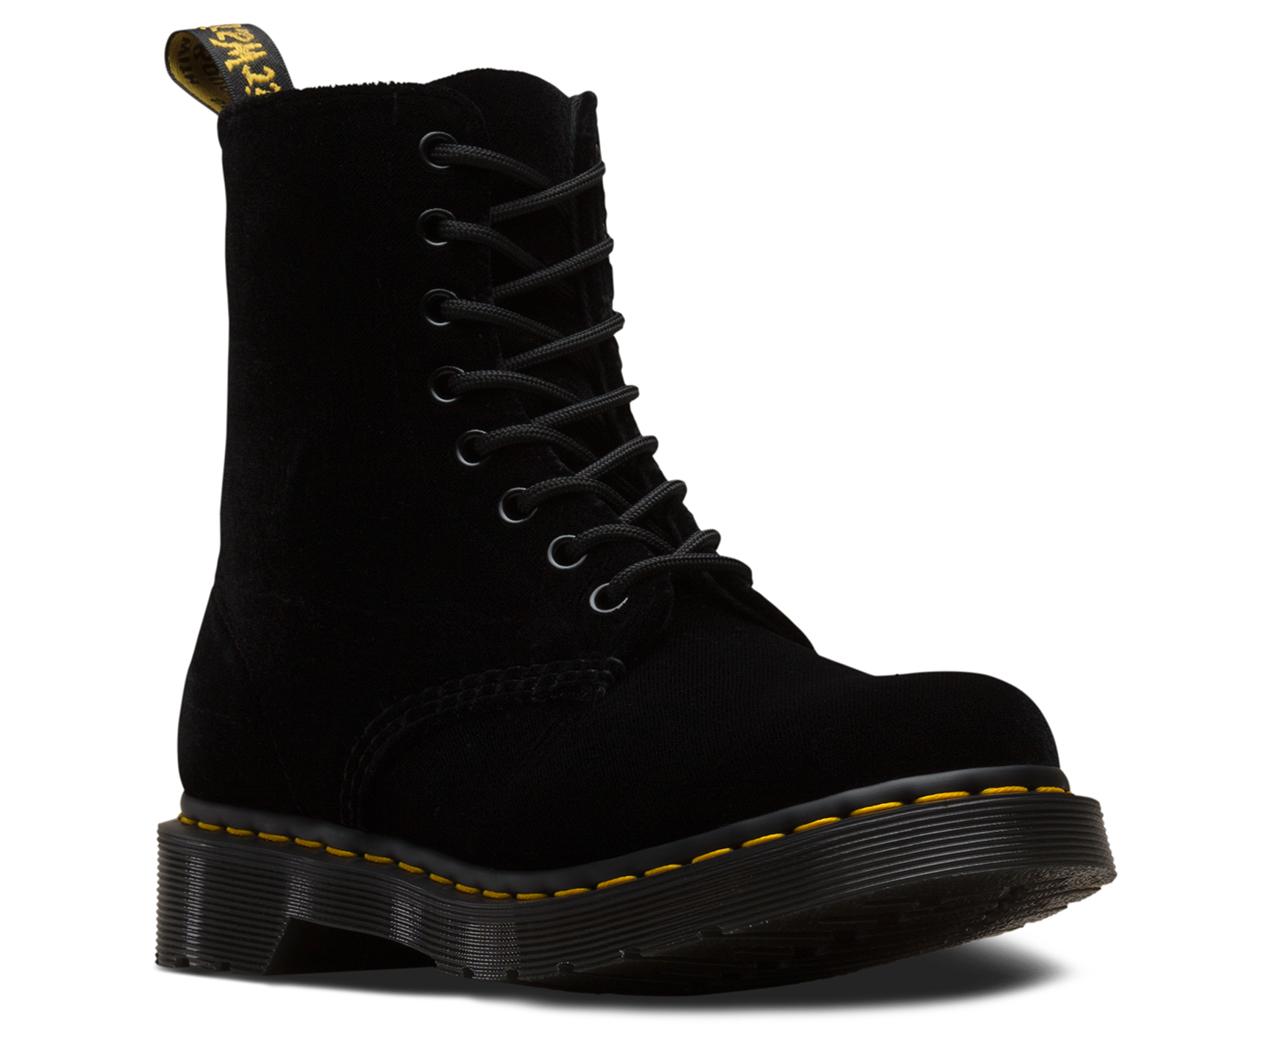 6e76bf916427c 1460 PASCAL VELVET | Women's Boots & Shoes | Canada